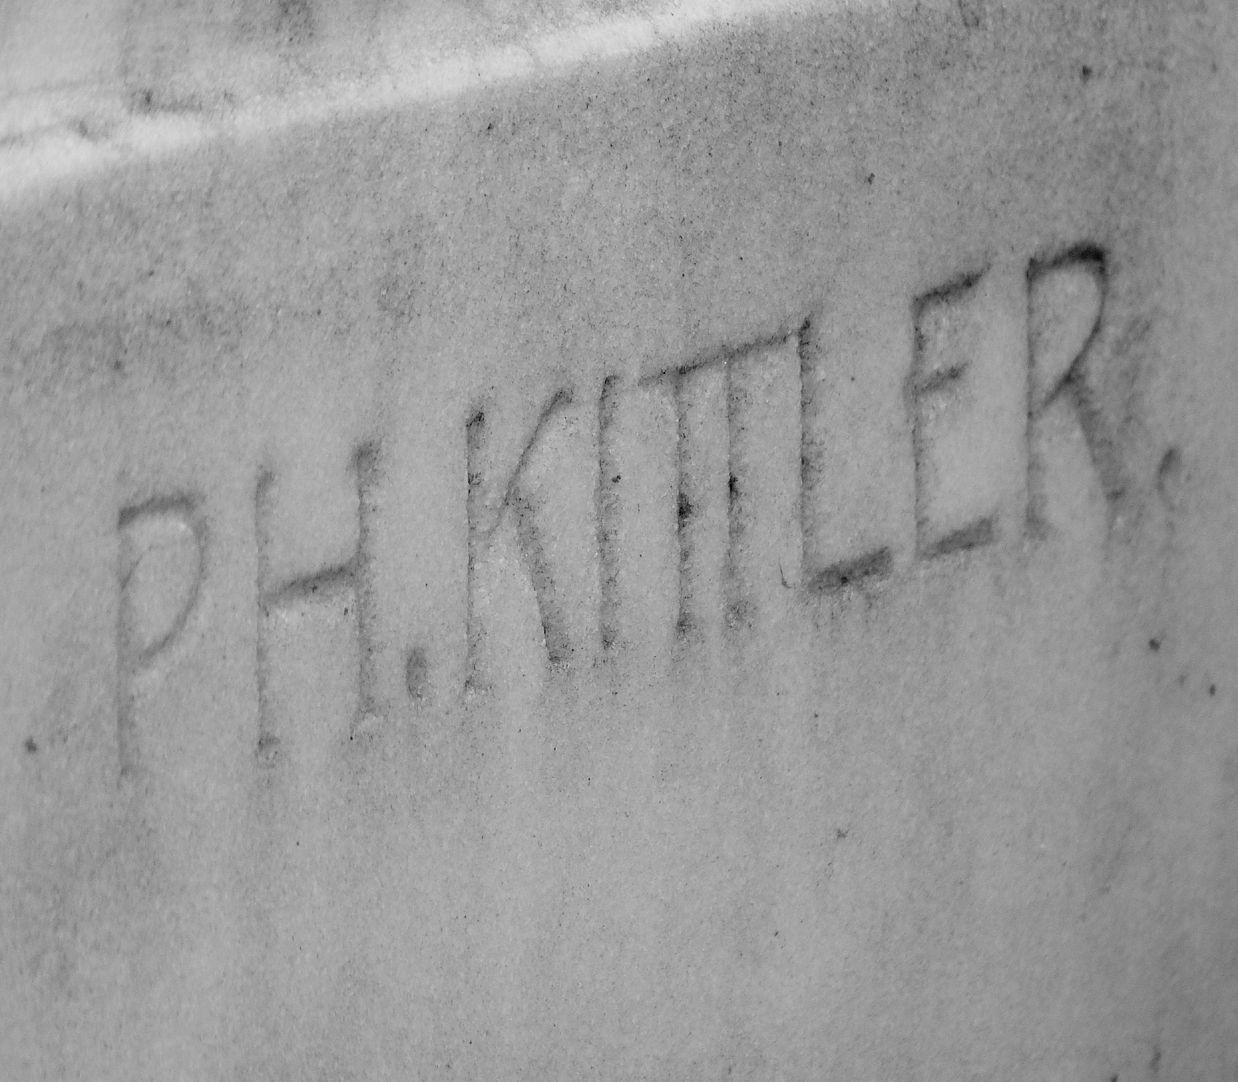 Grabmal Familie Heinrich Zeltner Künstlersignatur an der unteren rechten Ecke